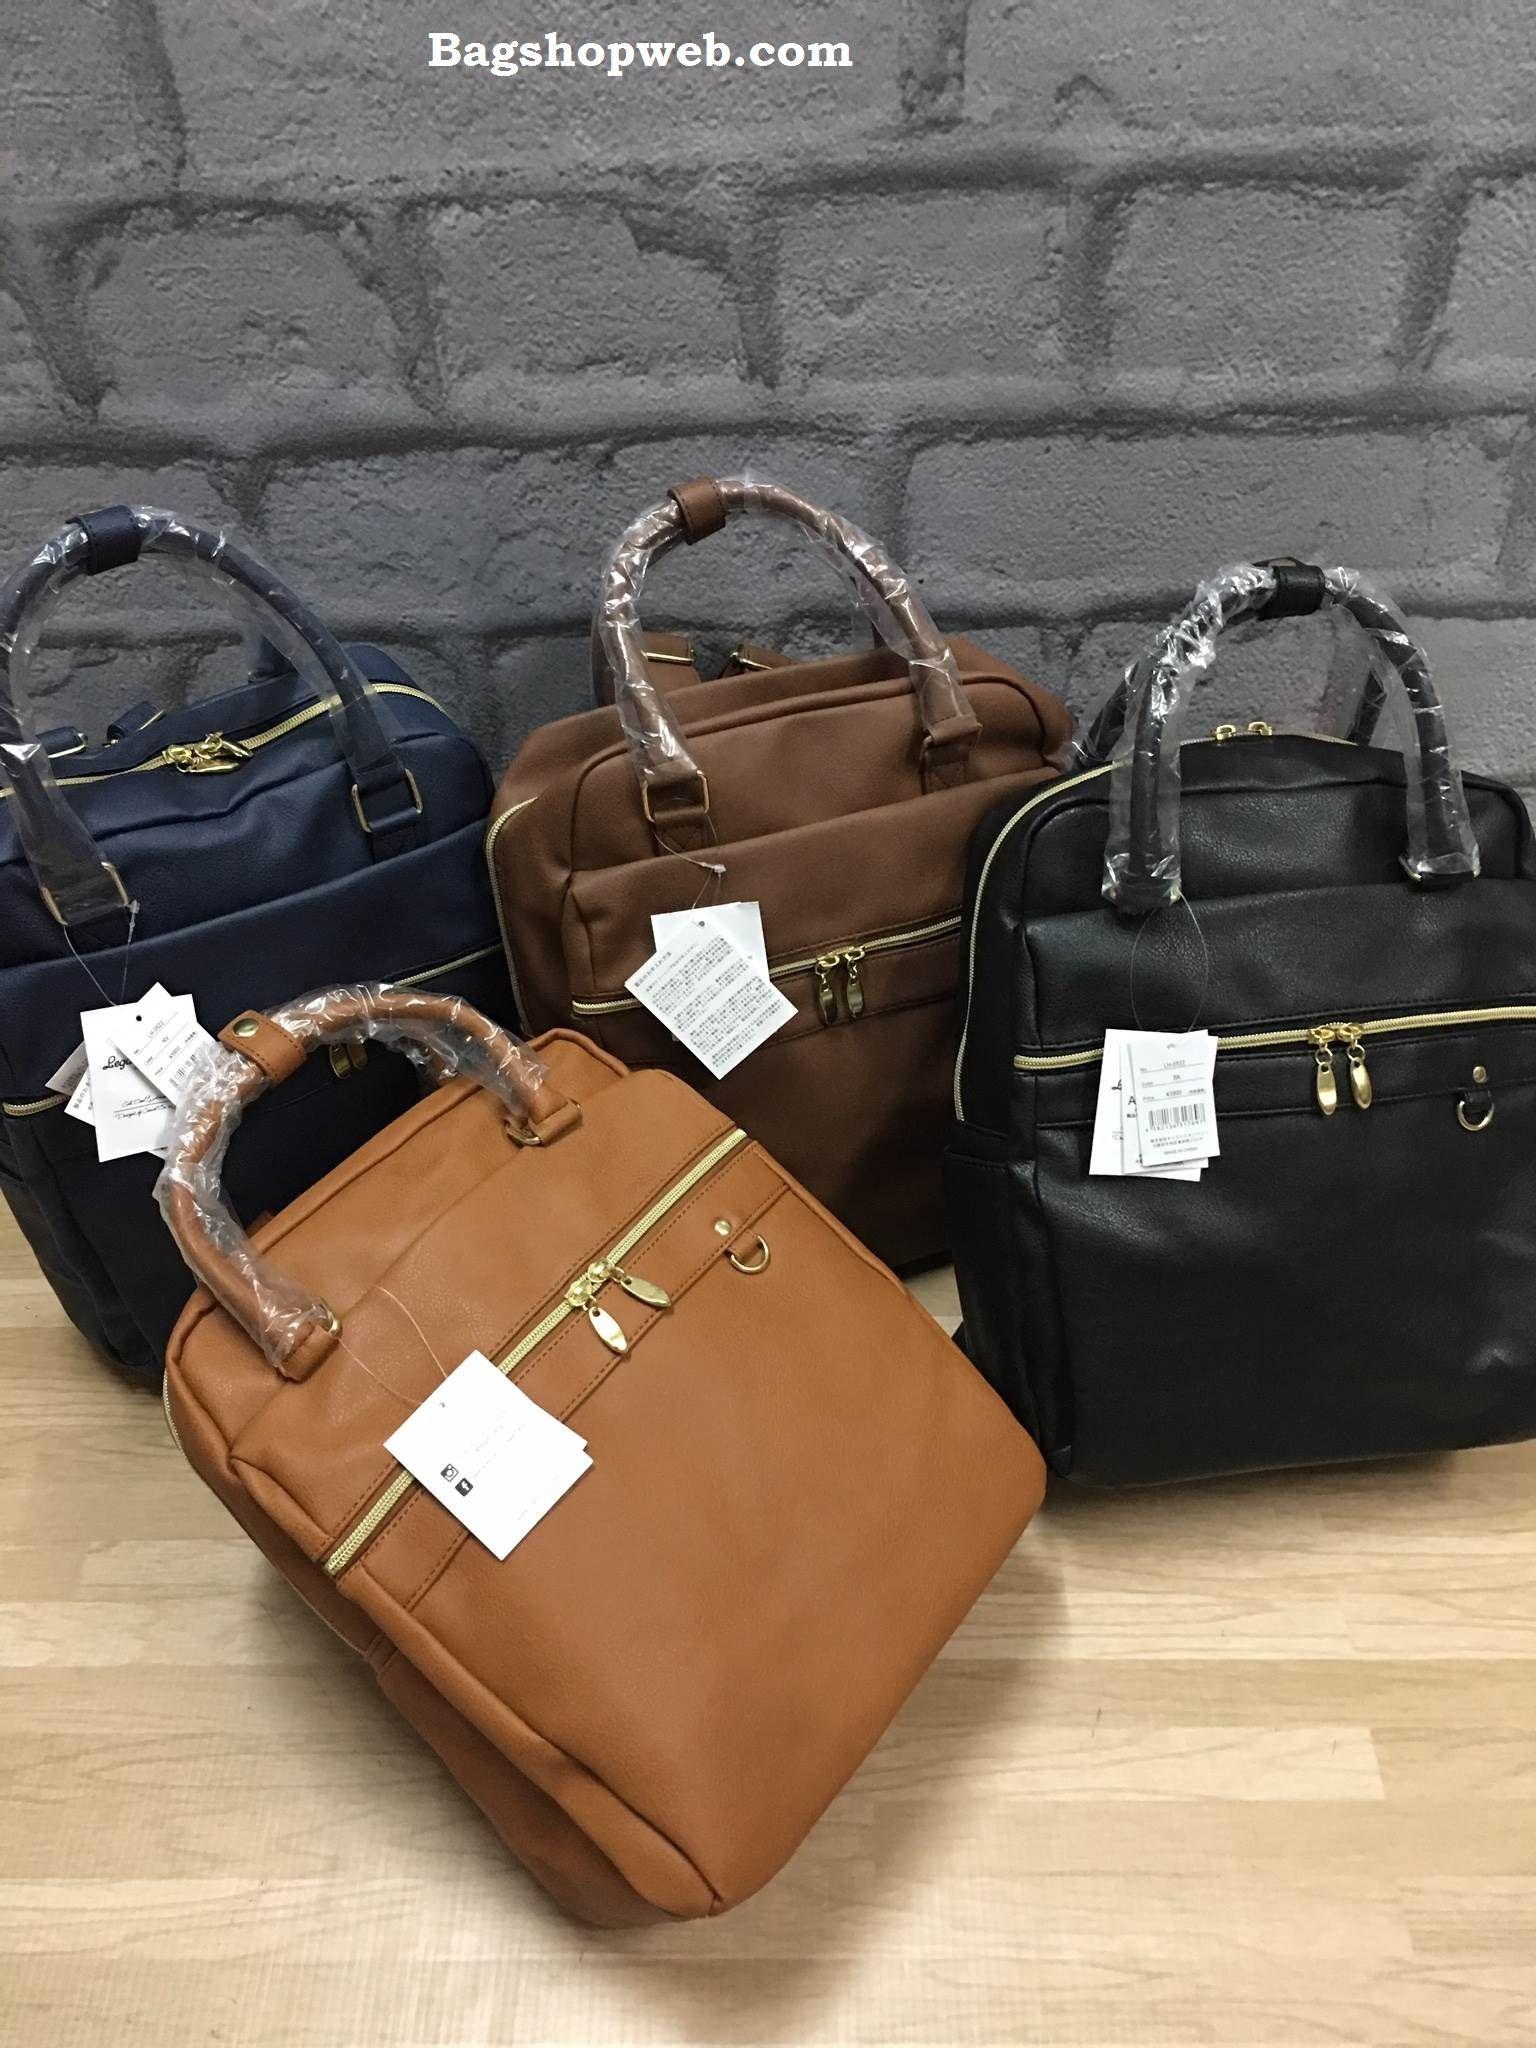 d3432c263a กระเป๋า-legato-largo-2-way-mini-rucksack-ราคา-1290-บาท-free-ems ...